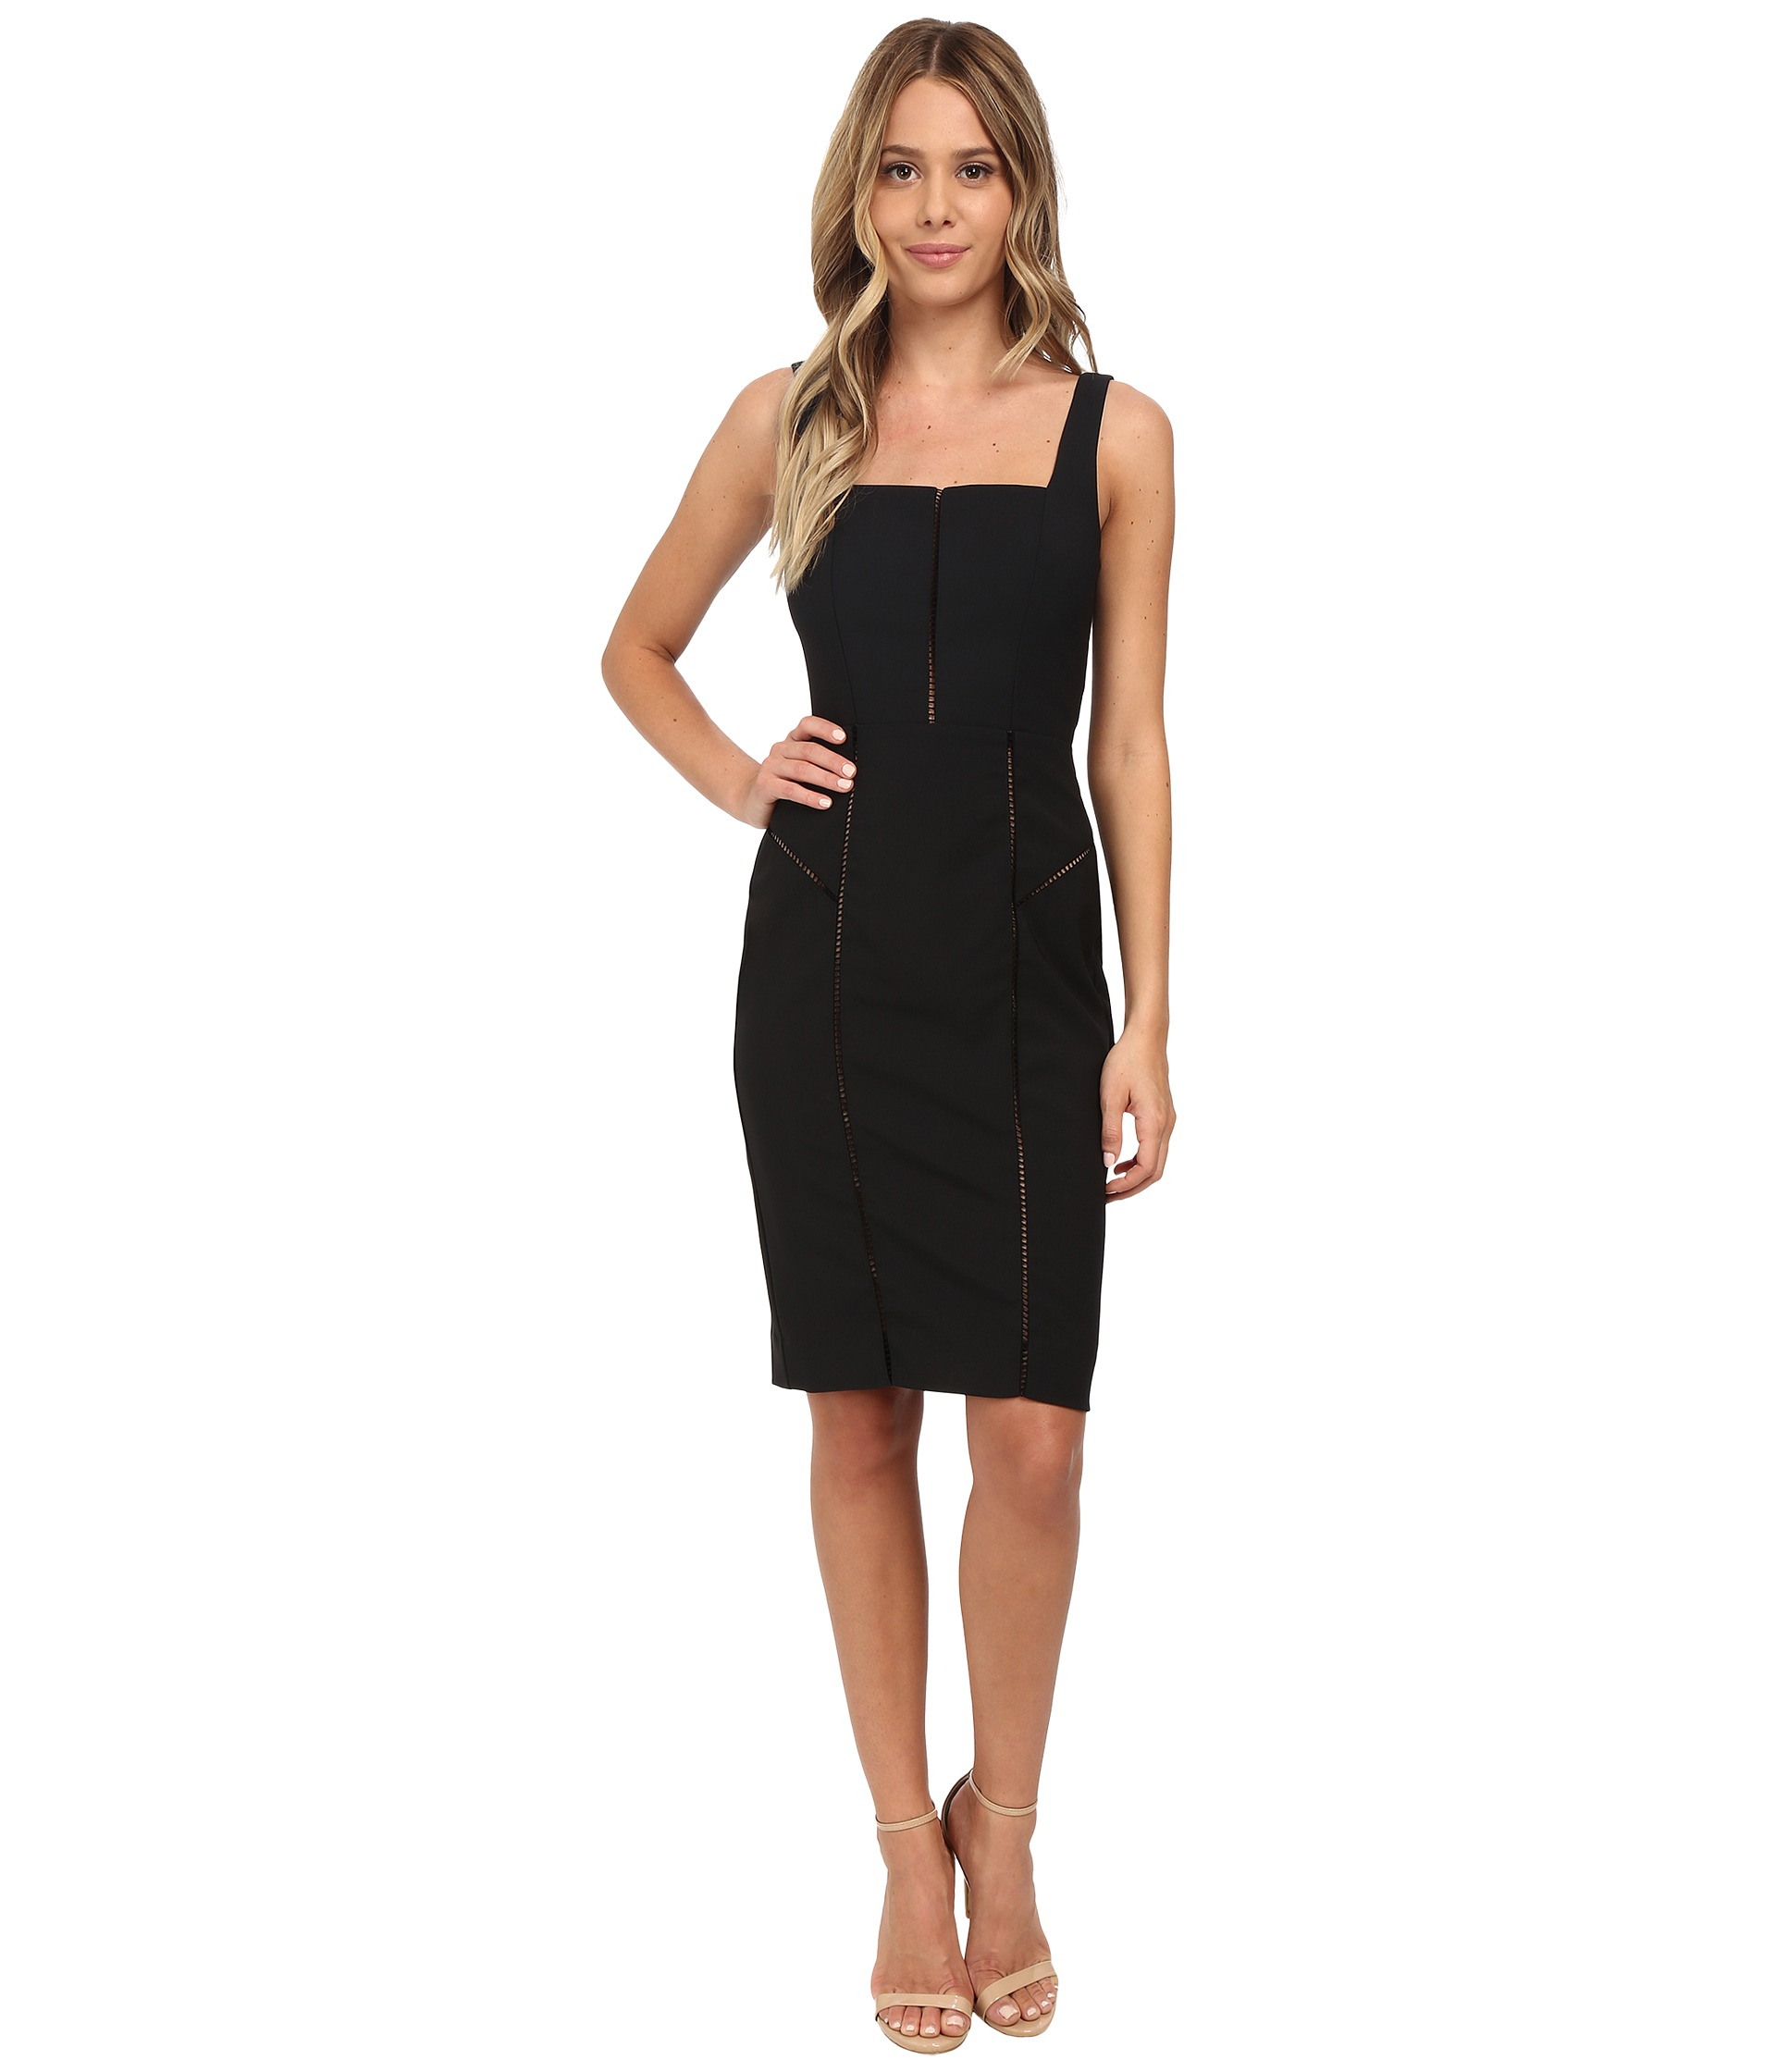 Nicole miller Alaiya Square Neck Cocktail Dress in Black  Lyst